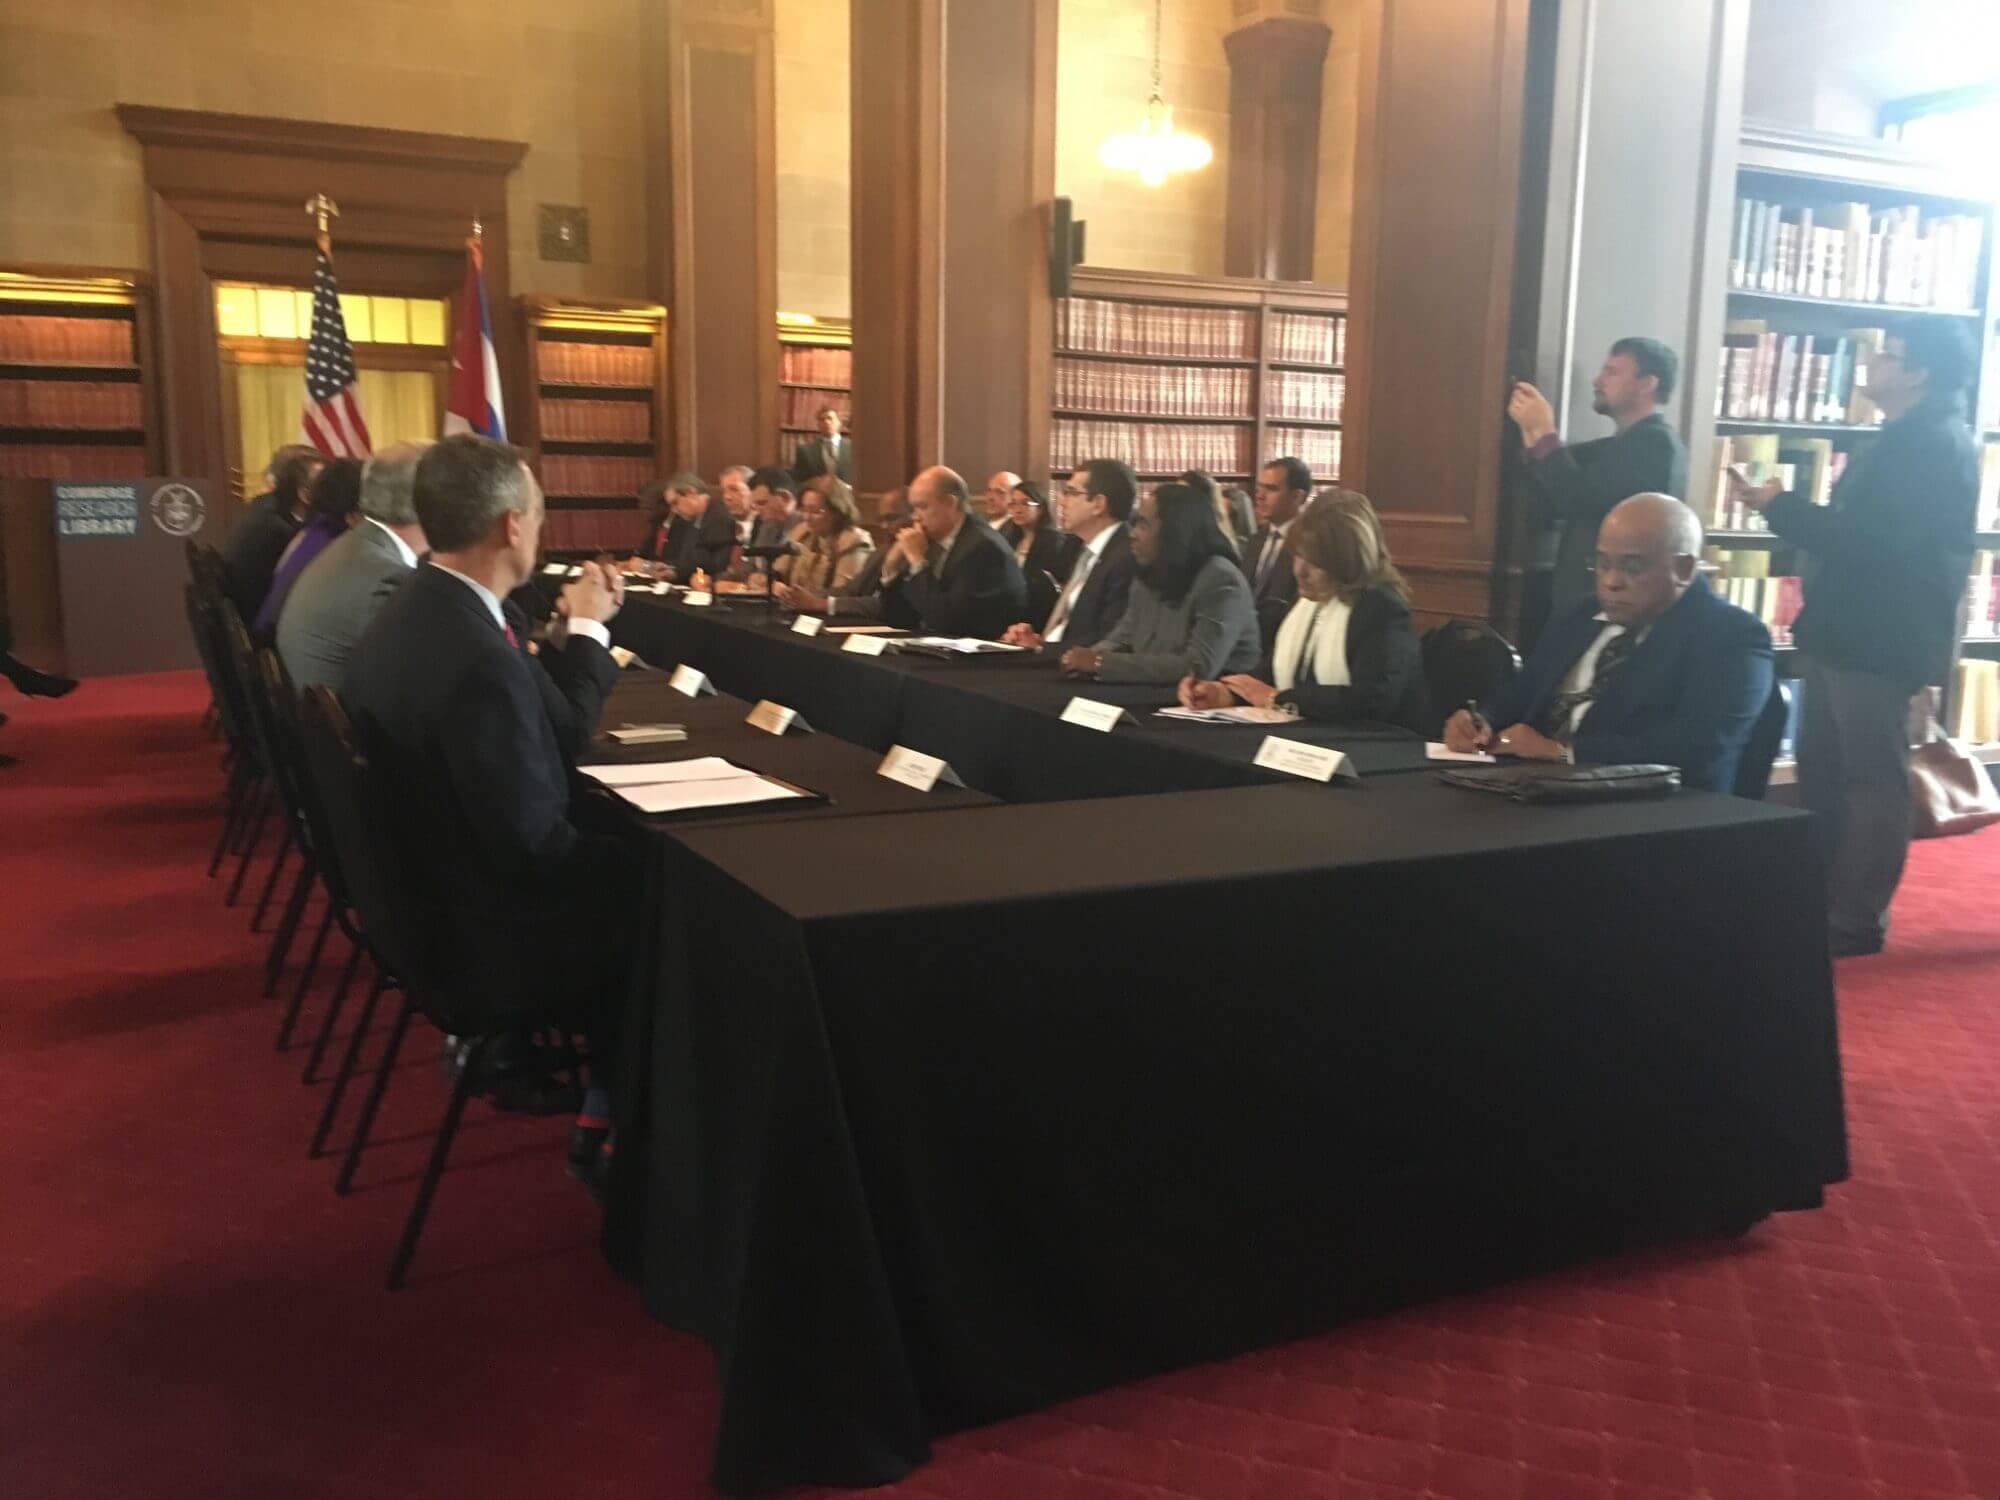 U.S., Cuba meet to discuss further business engagement